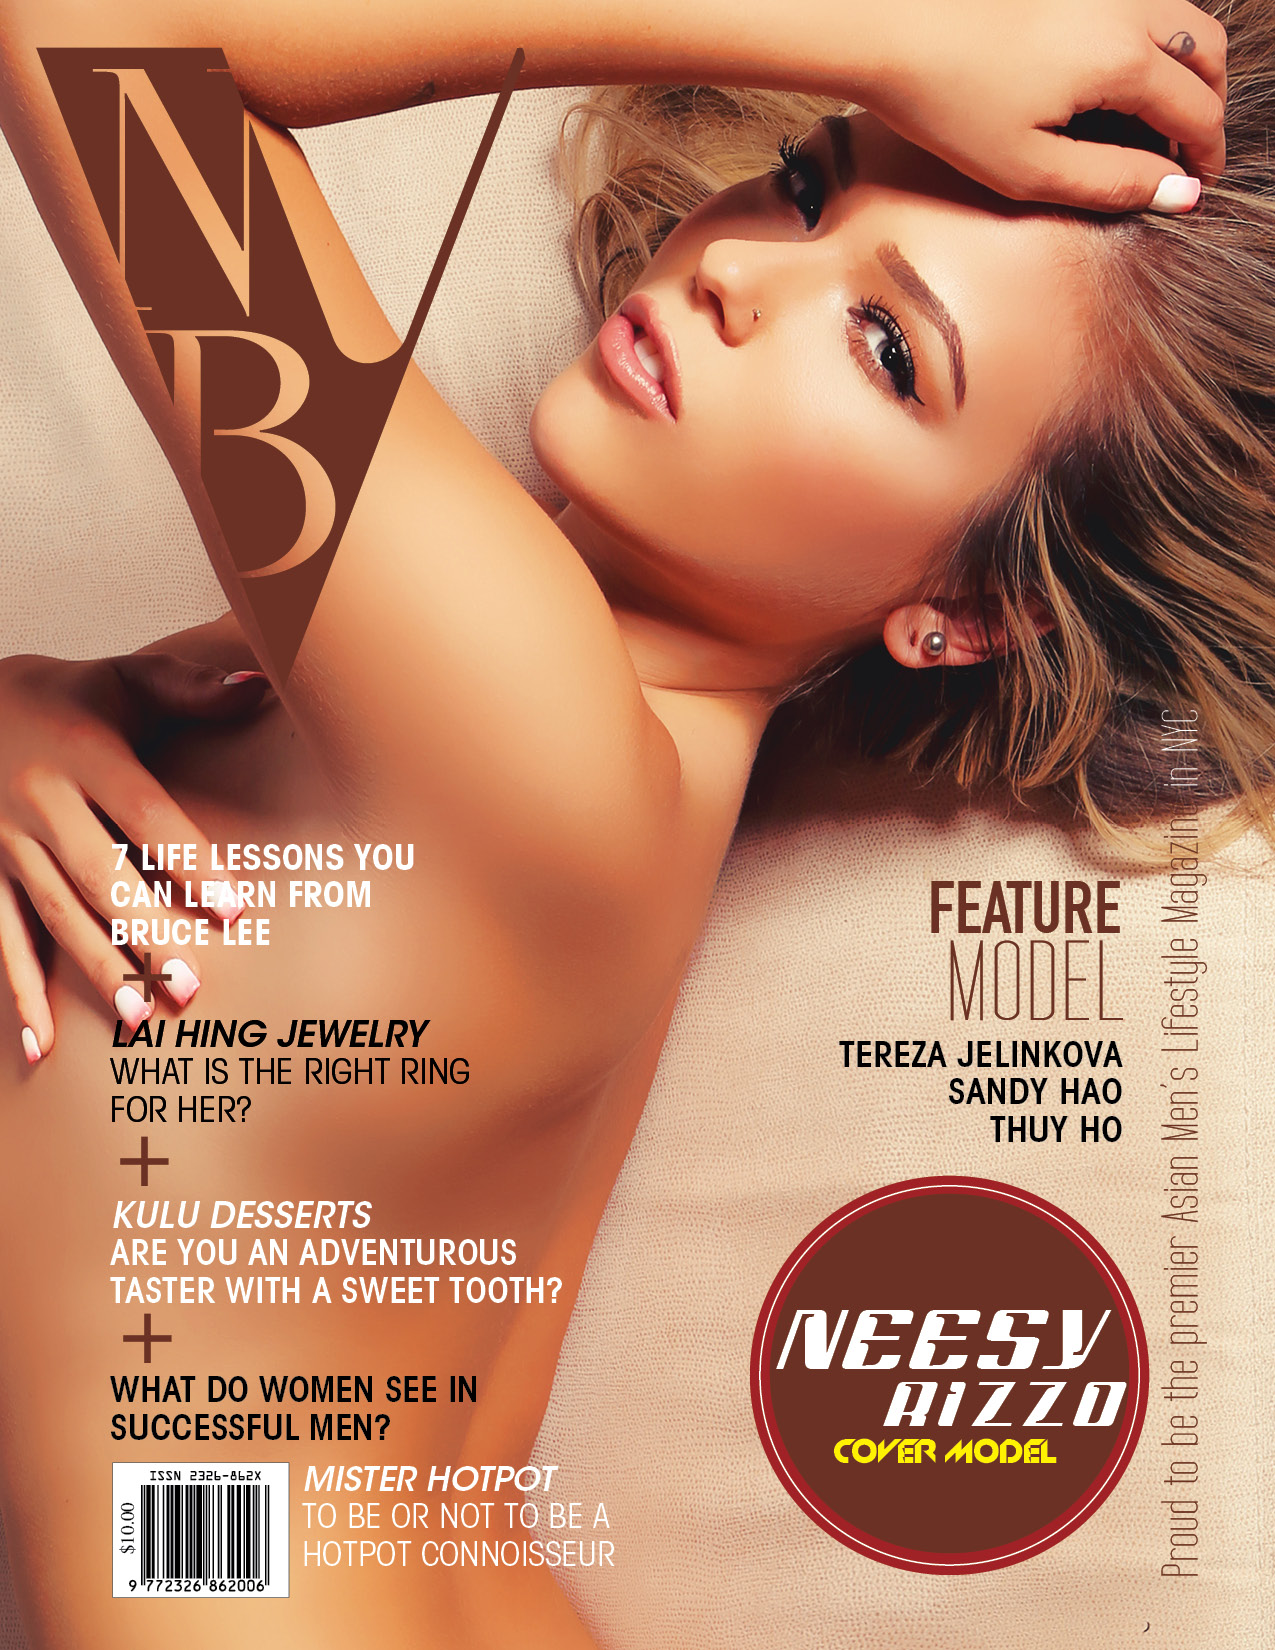 VNB magazine issue 23